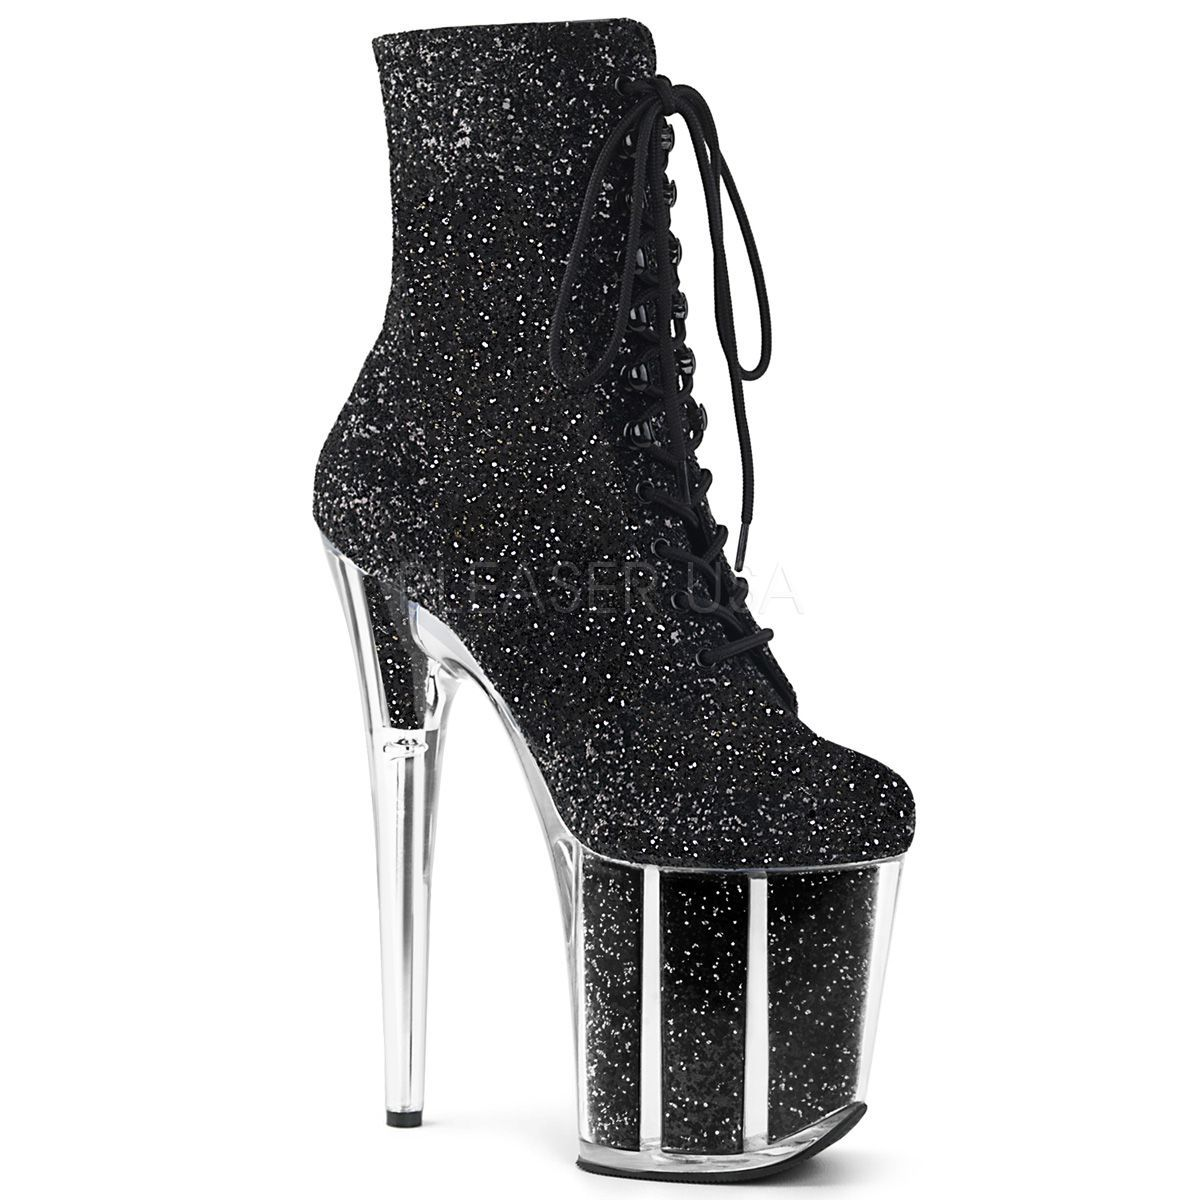 Bota Flamingo 1020 G Glitter e Acrílico Ankle Boot  - Pleaser (encomenda)